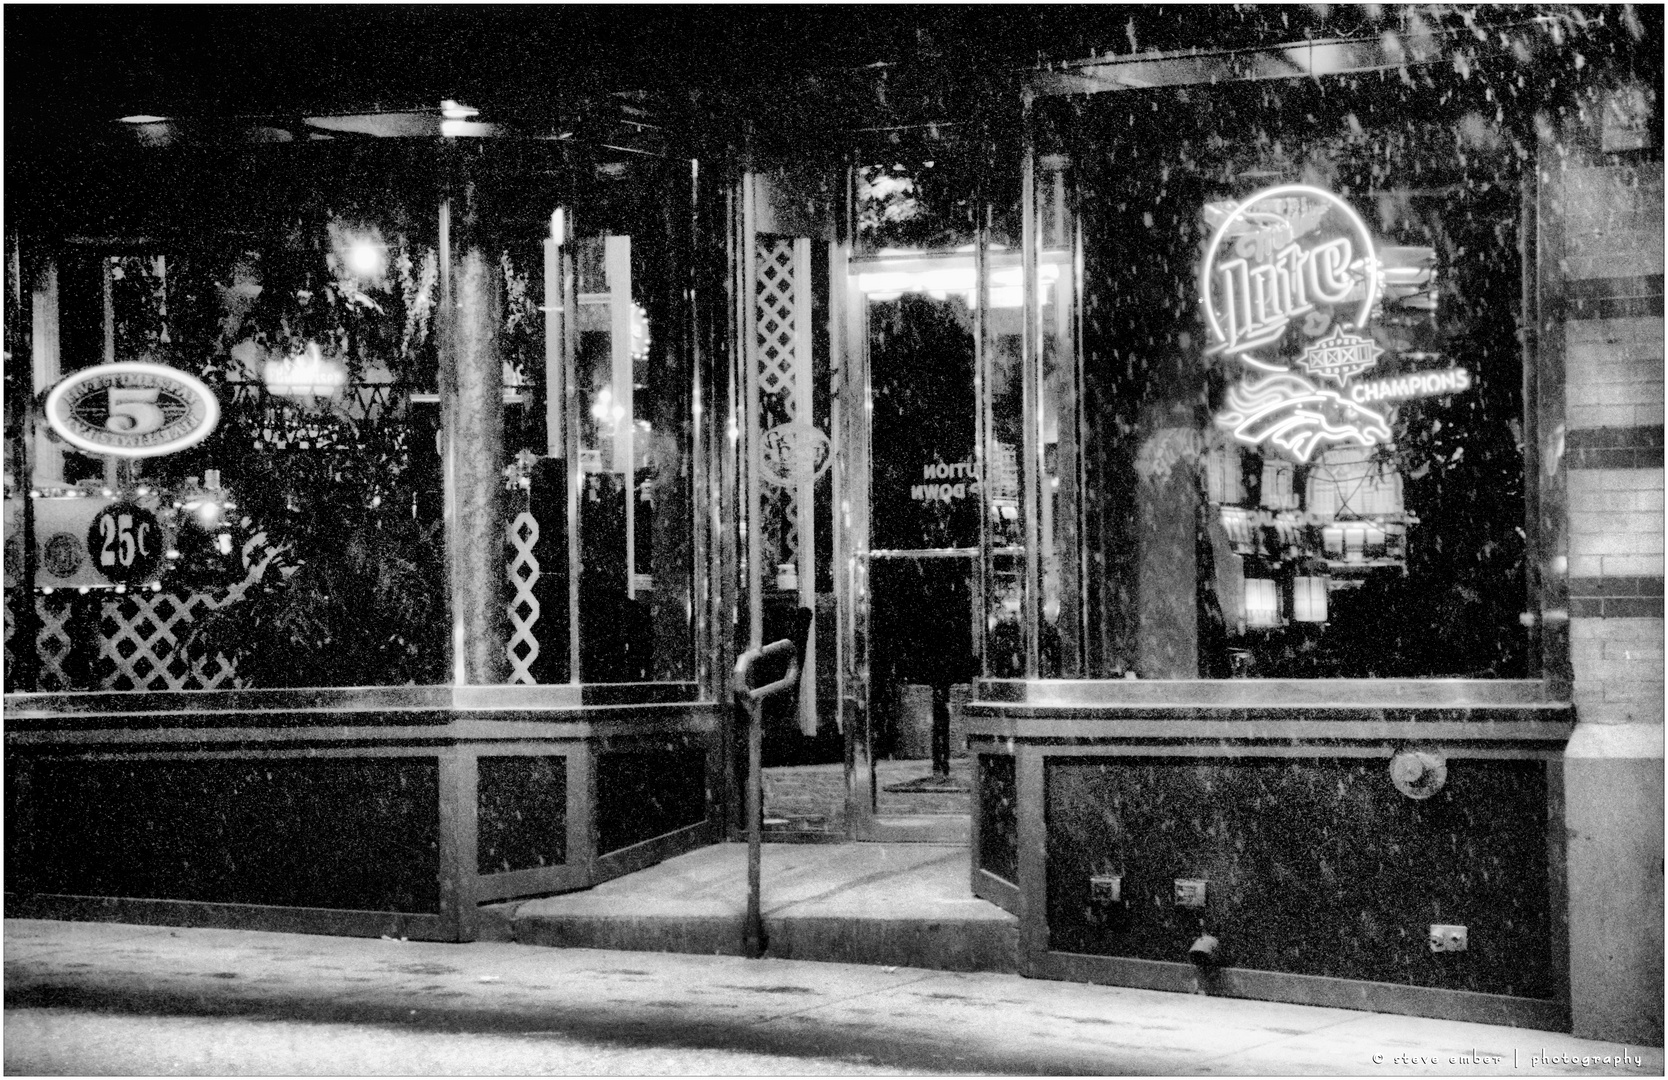 Deadwood Saloon on a Snowy South Dakota Night